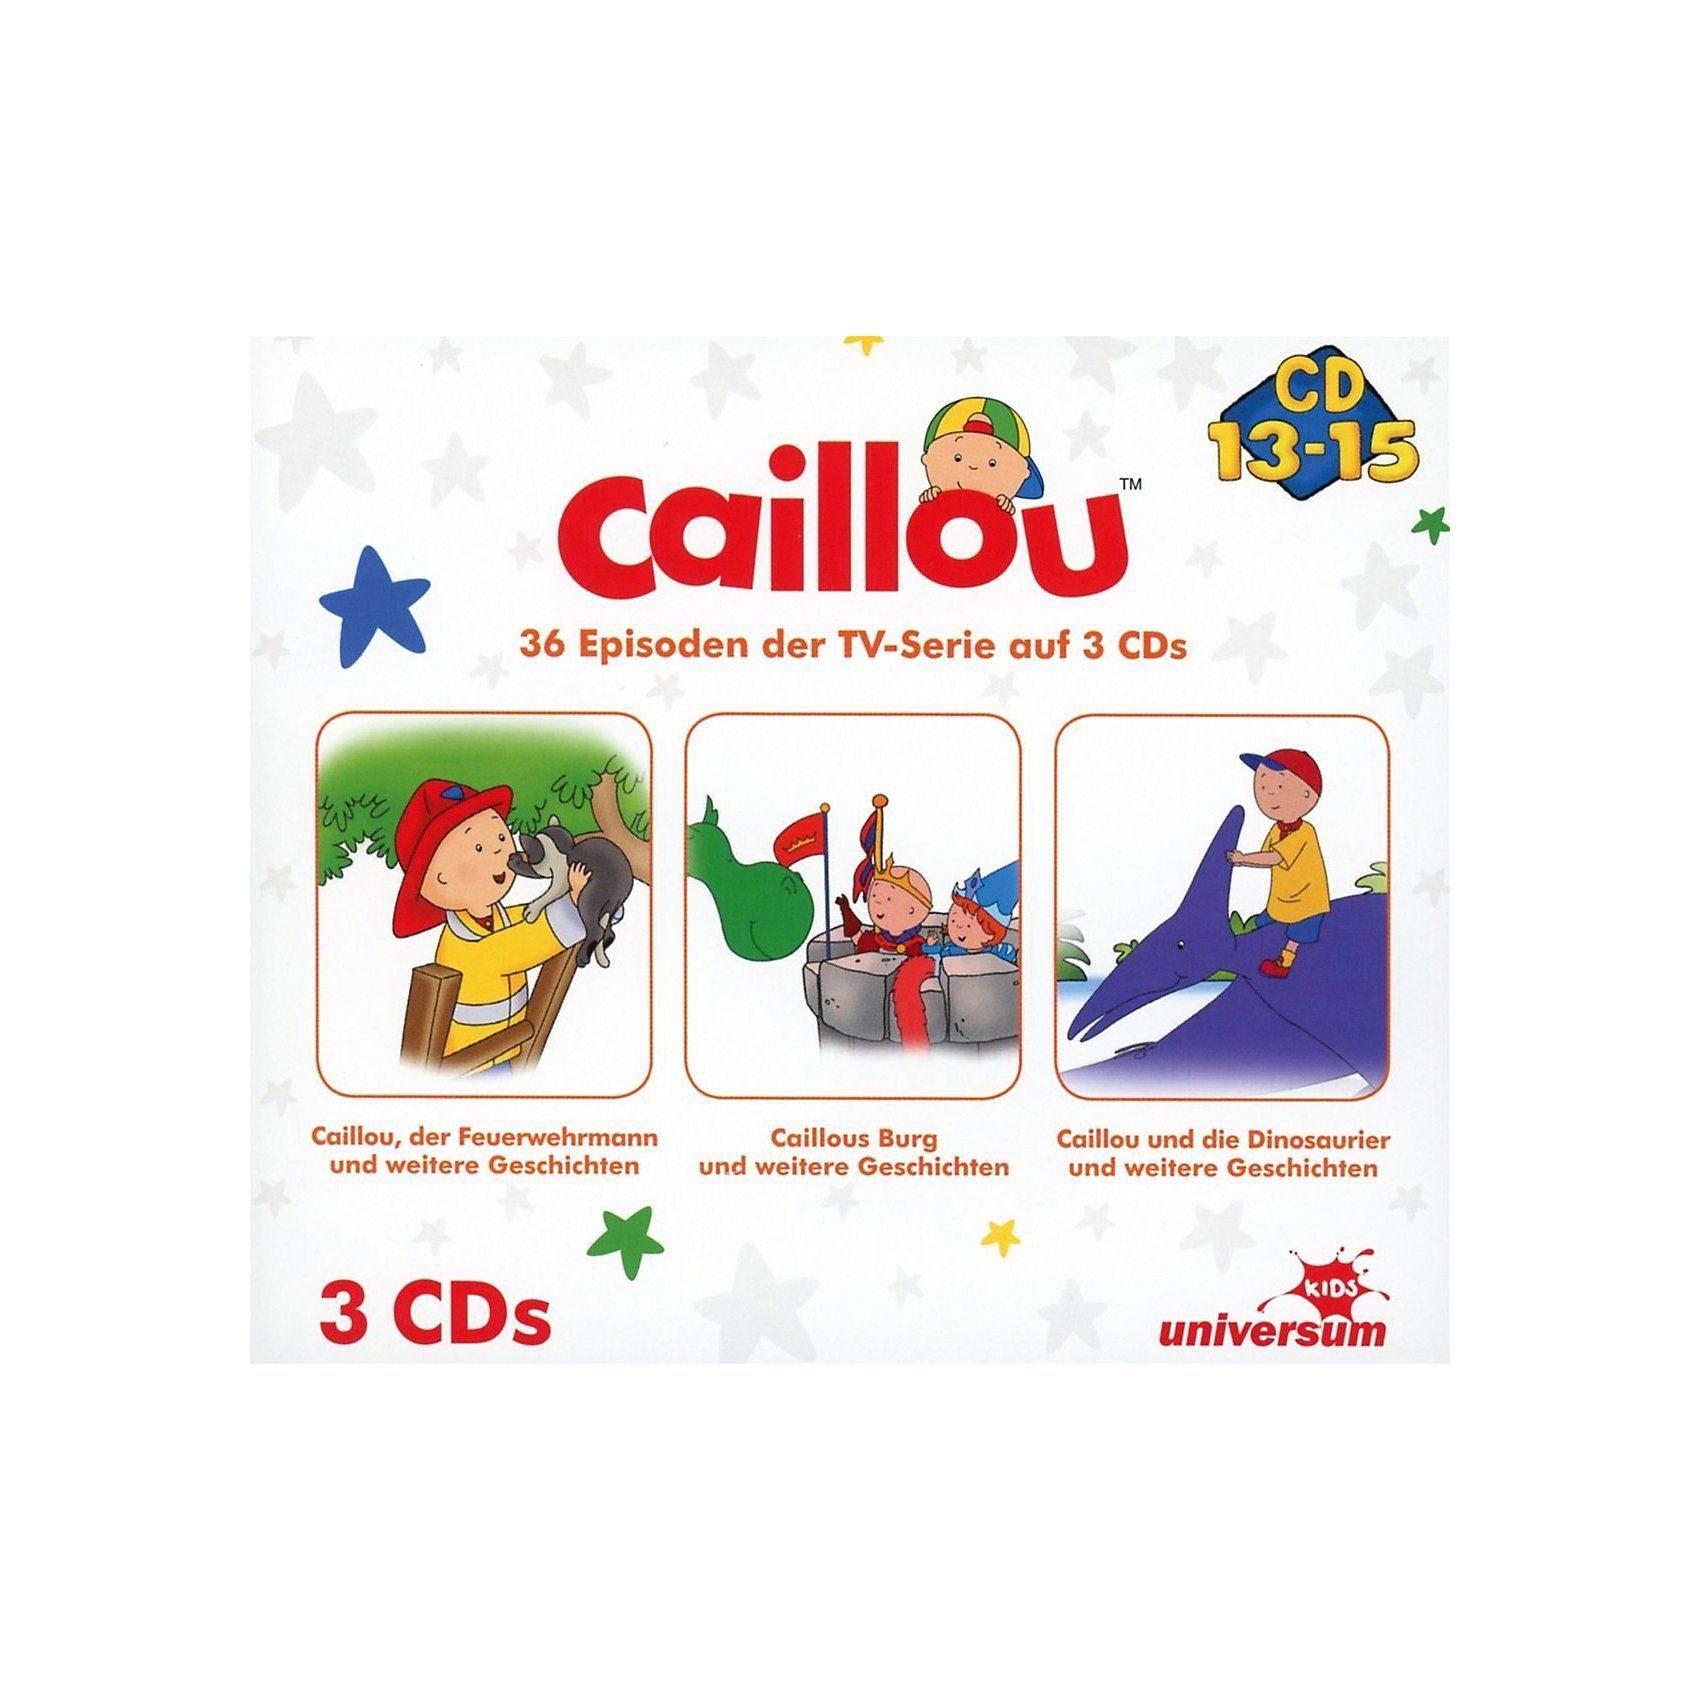 CD Caillou Hörspielbox 5 (CD 13-15)(3 CDs)